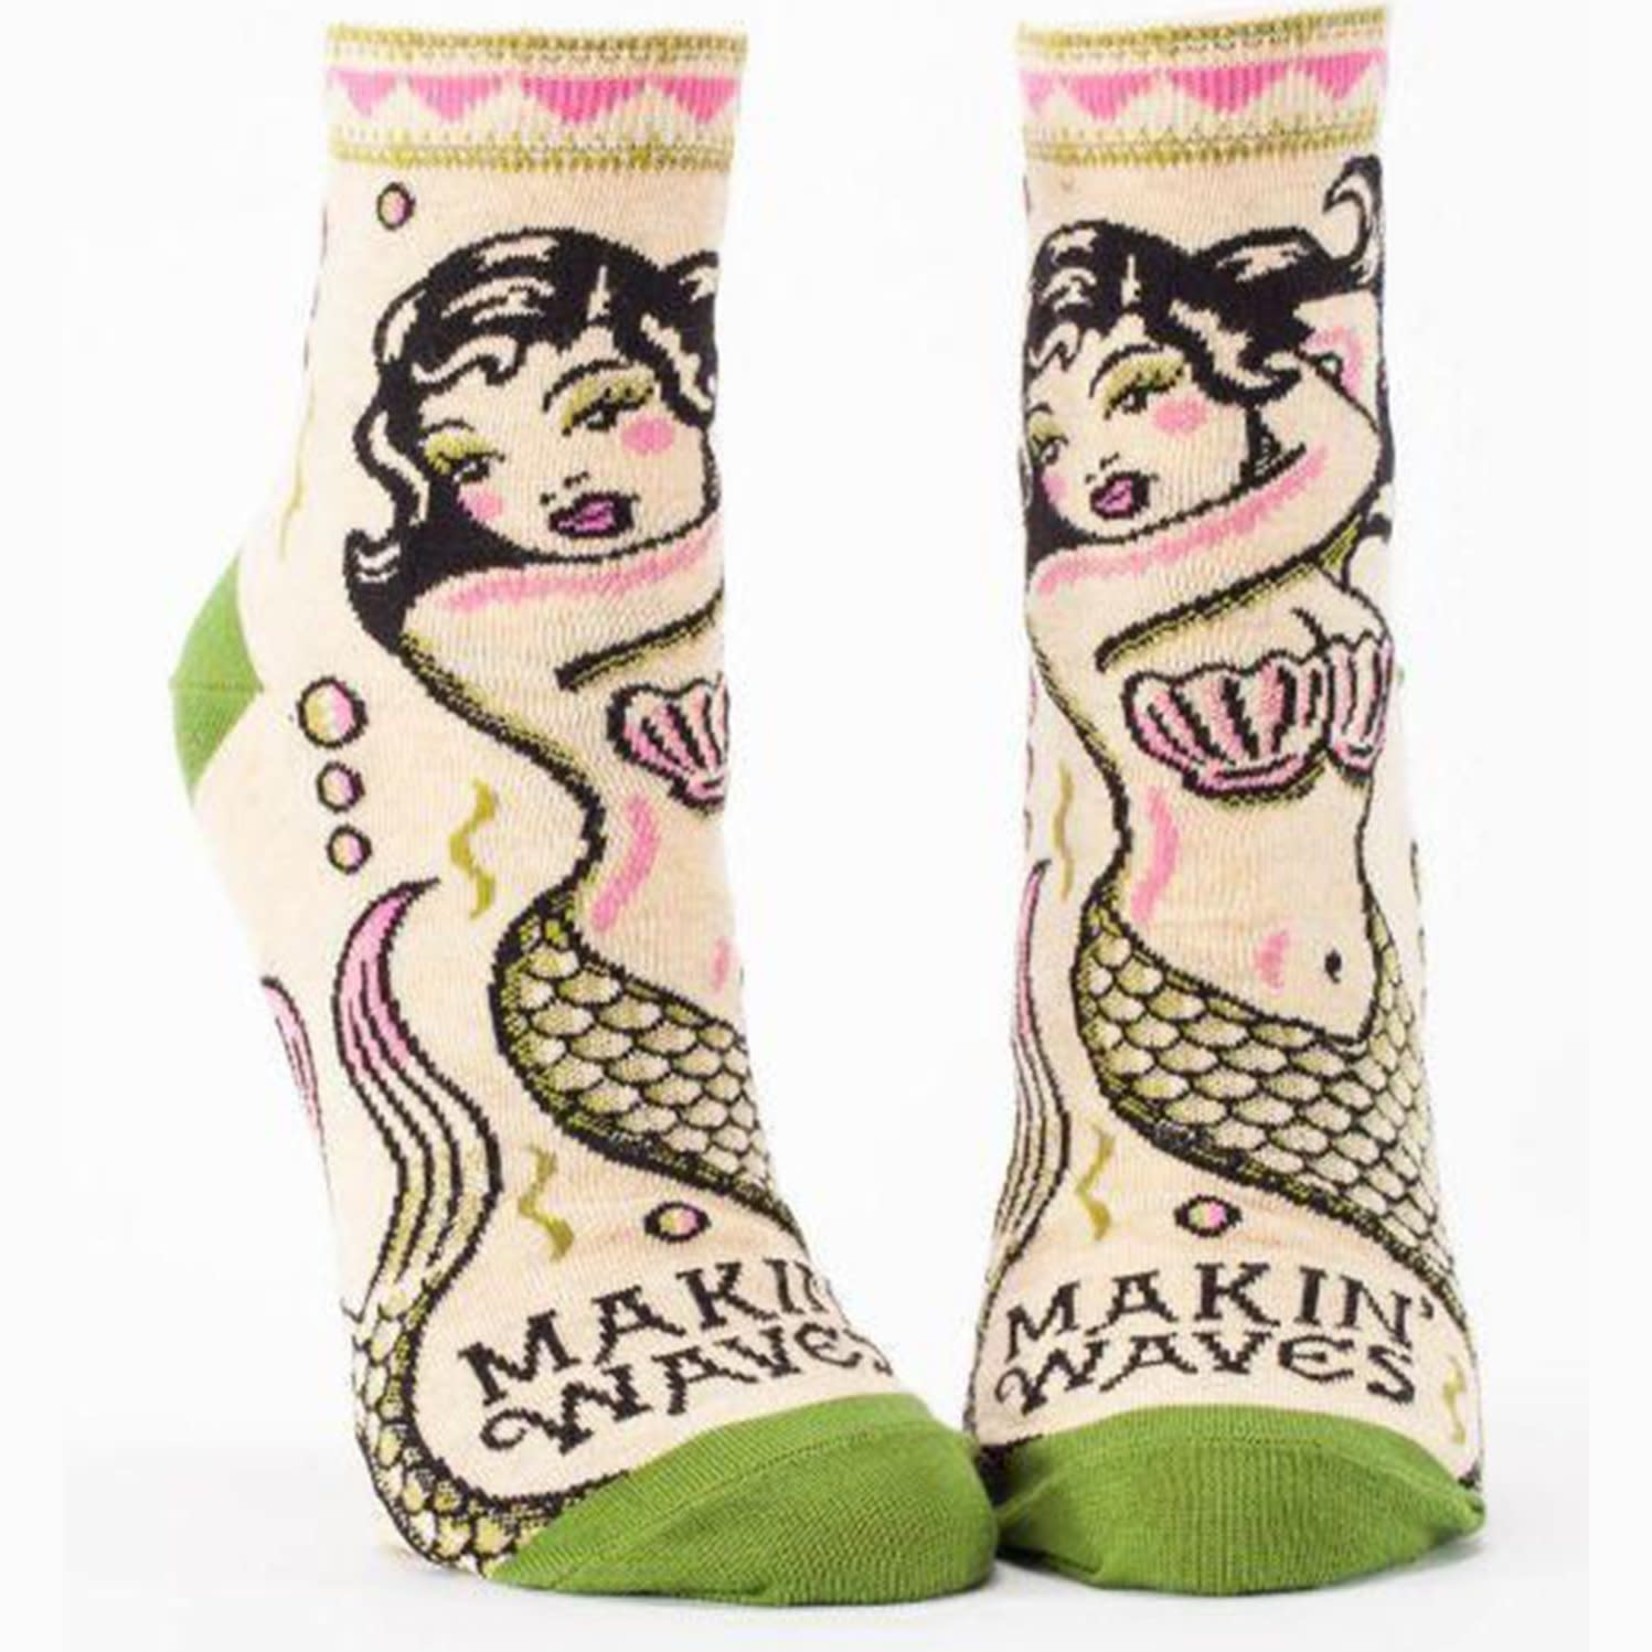 Socks (Womens) (Ankle) - Making Waves